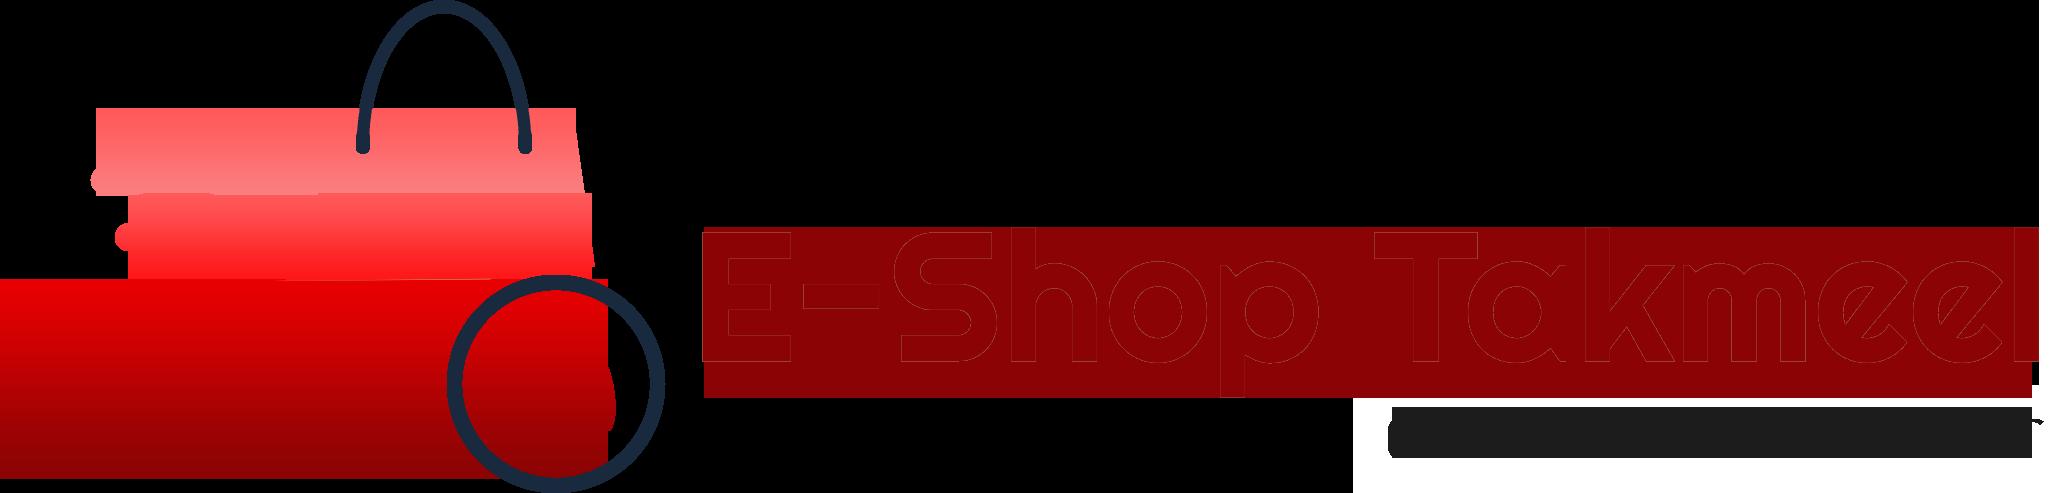 Takmeel E-Shop